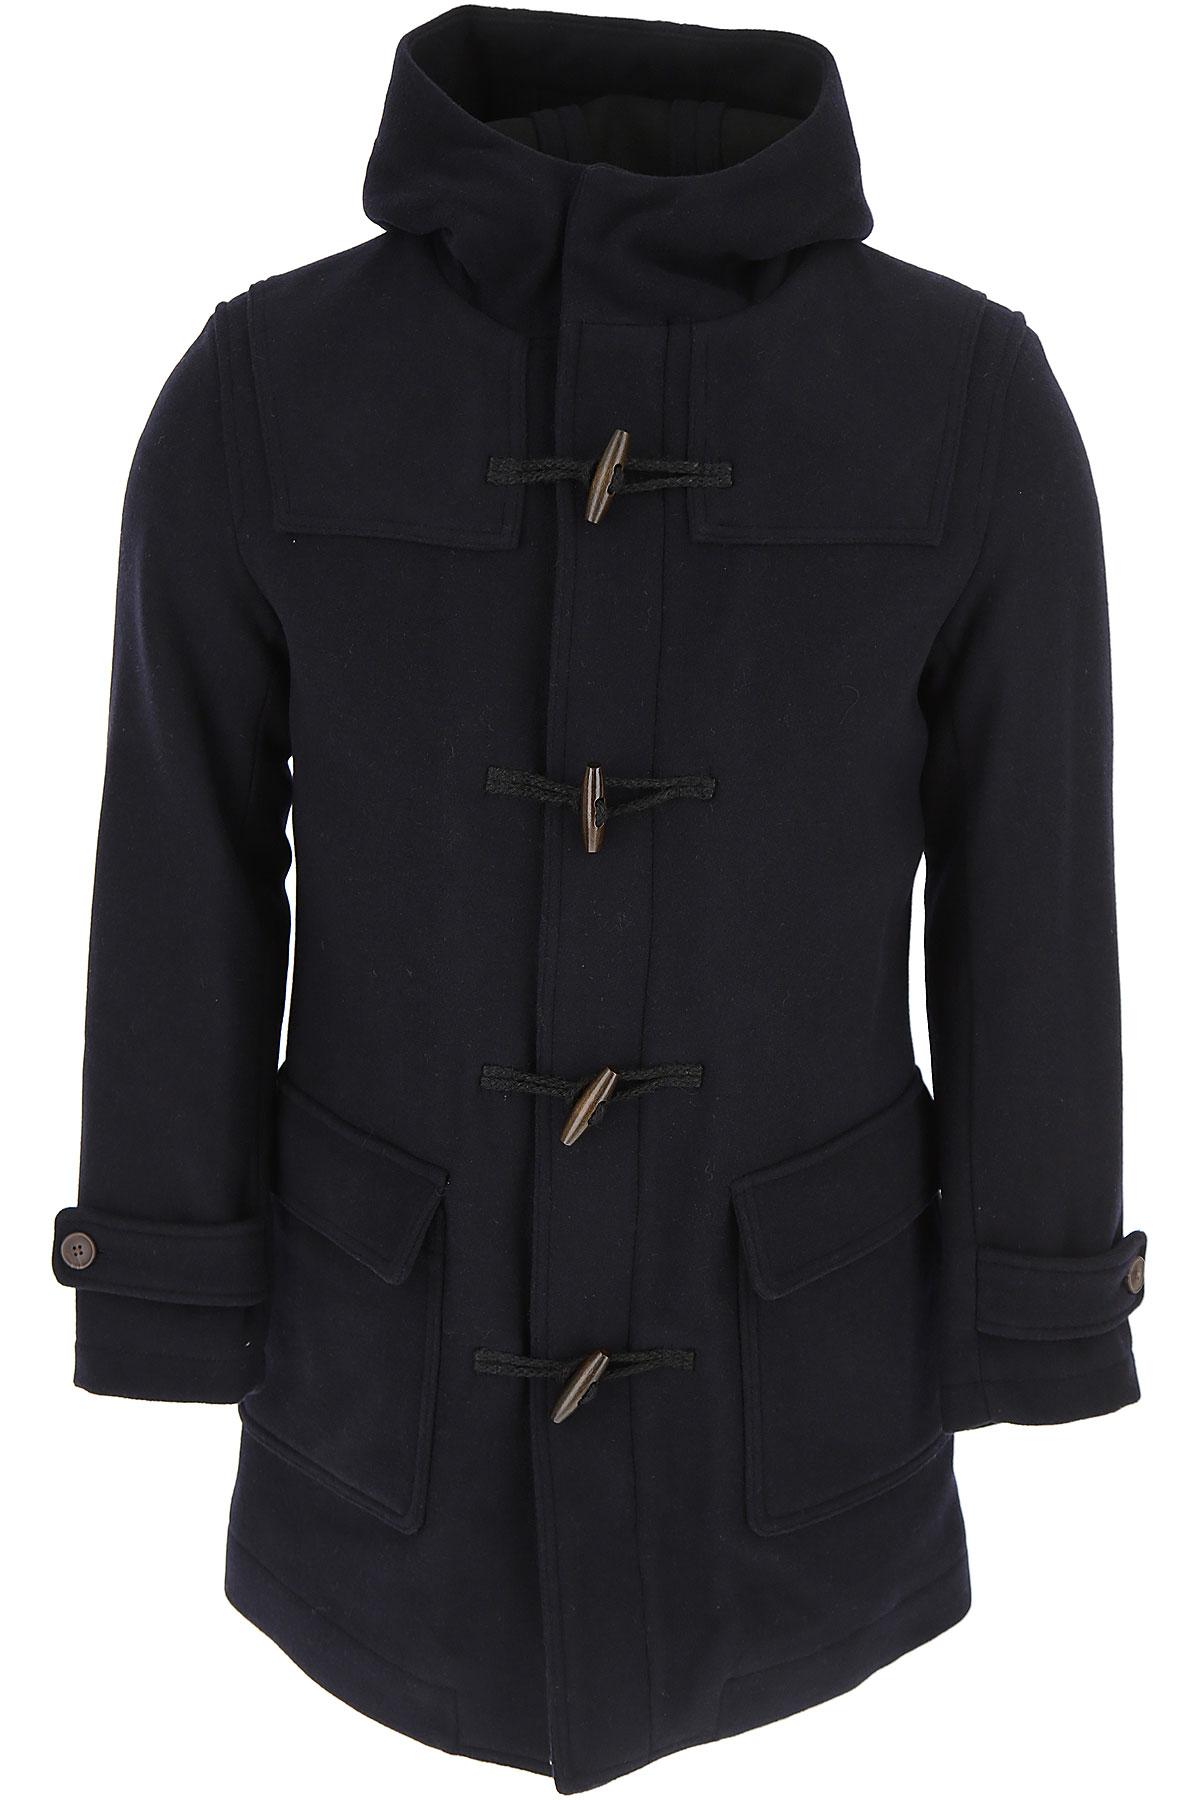 Image of Selected Men\'s Coat, Dark Saphire, polyester, 2017, L M S XL